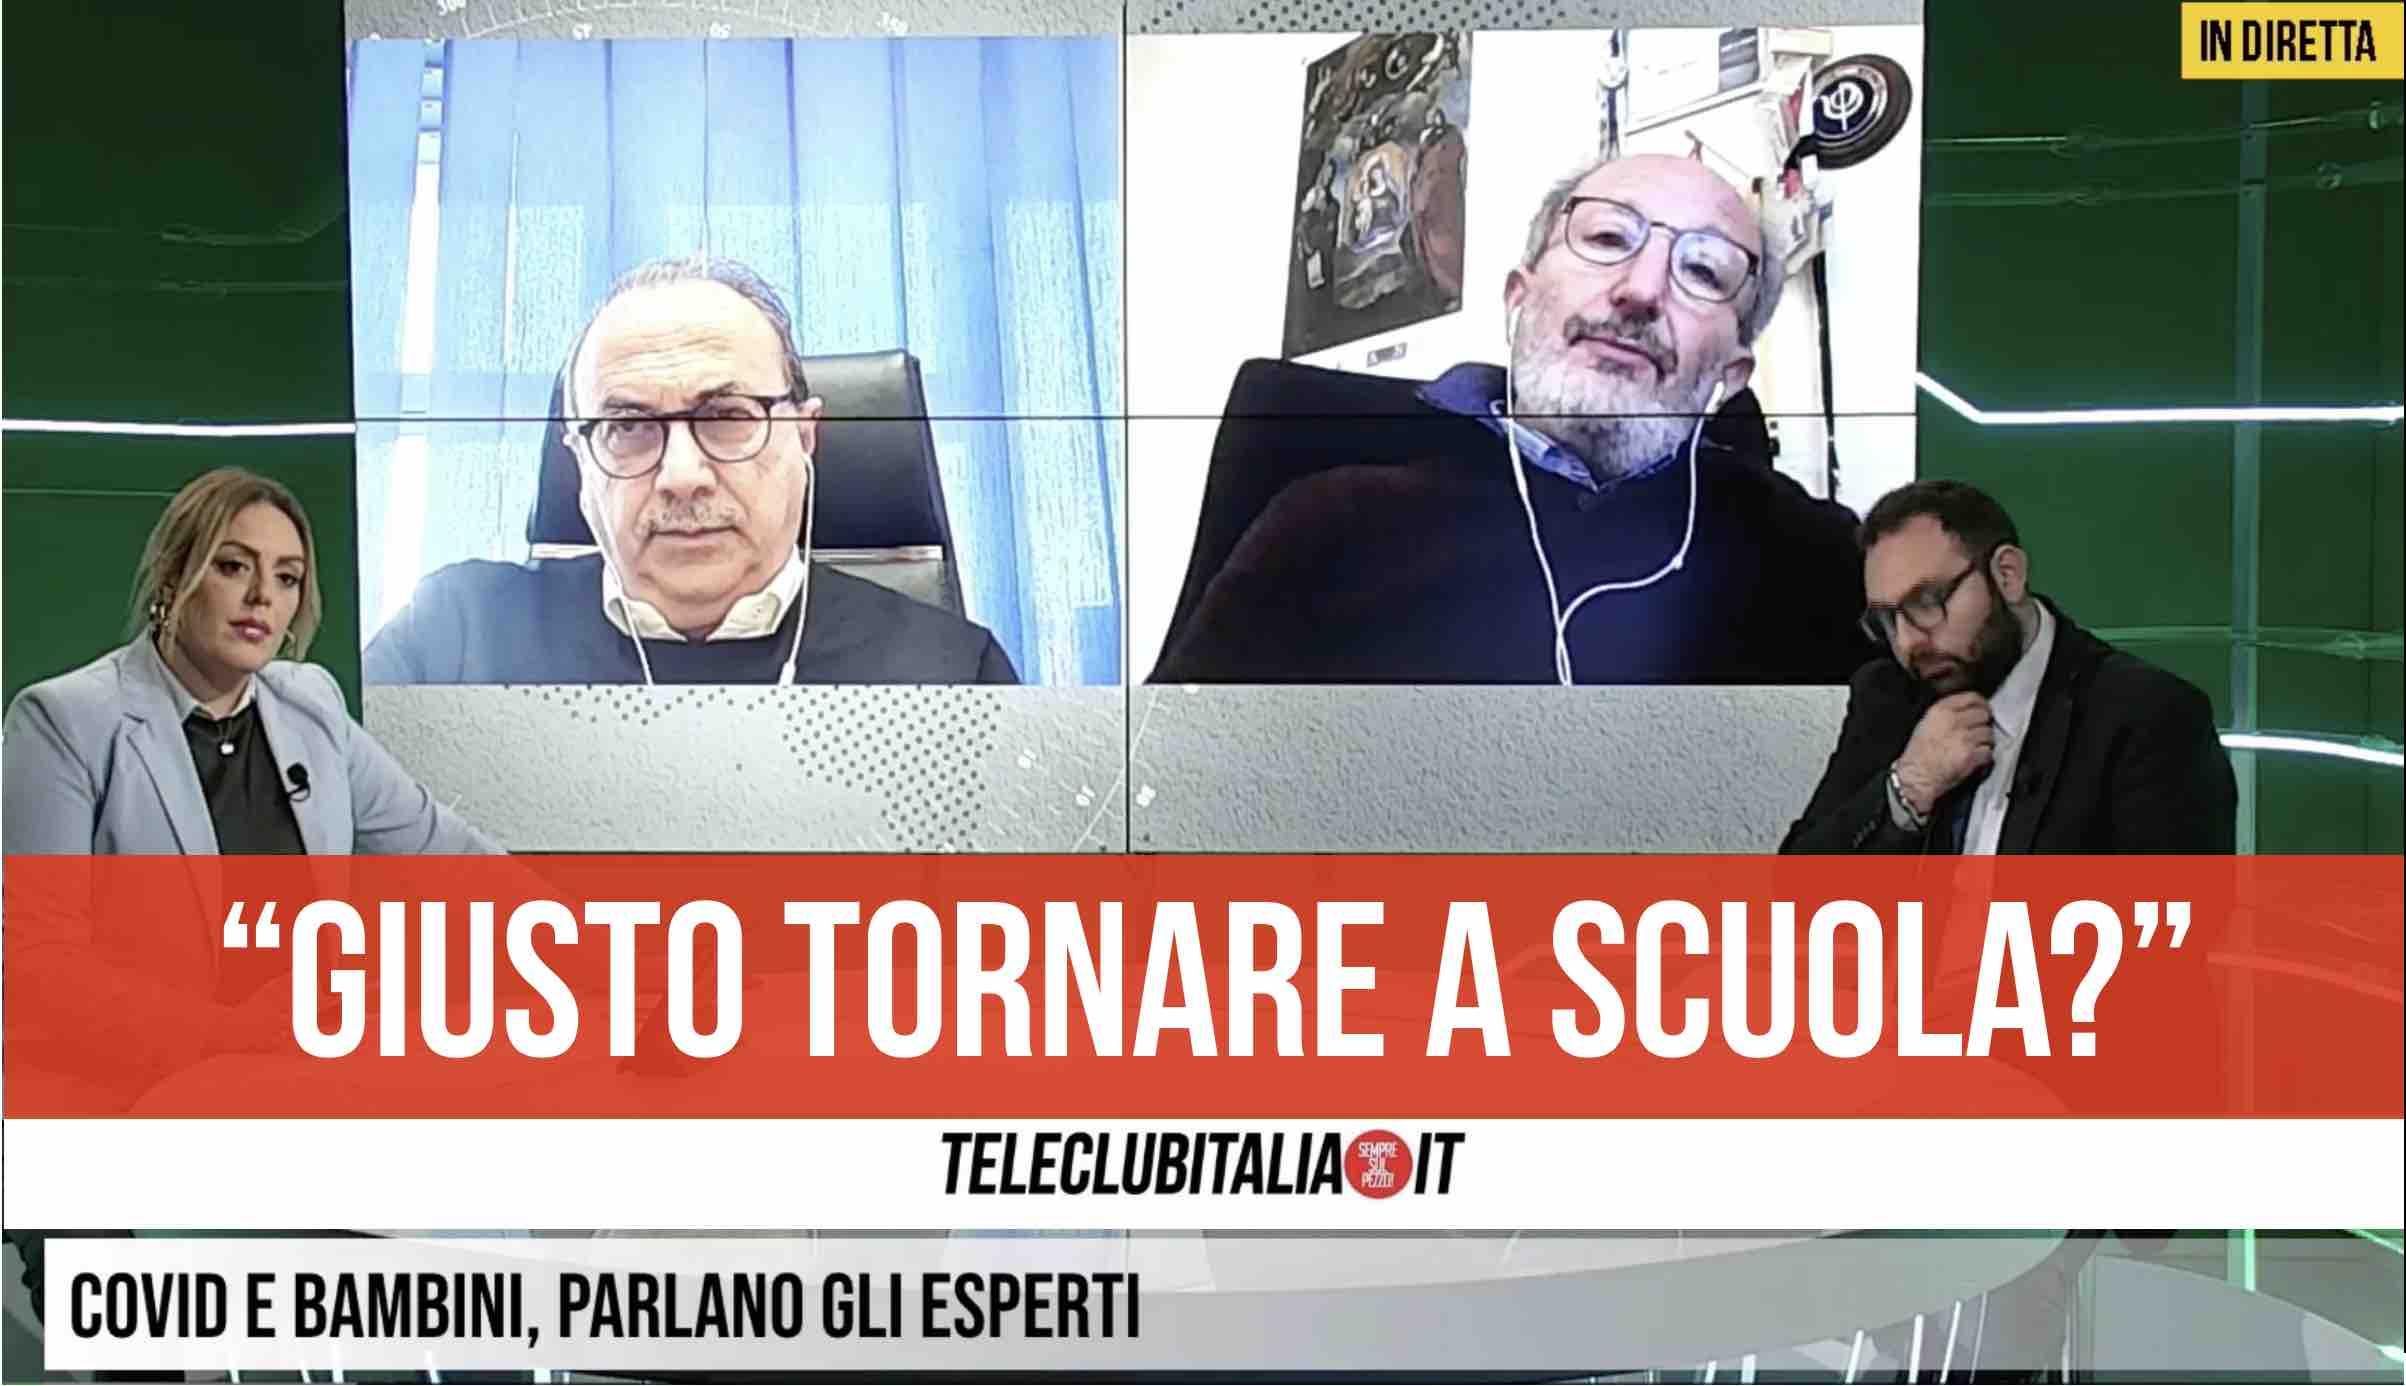 campania oggi scuola teleclubitalia.raffaele felaco luigi martemucci